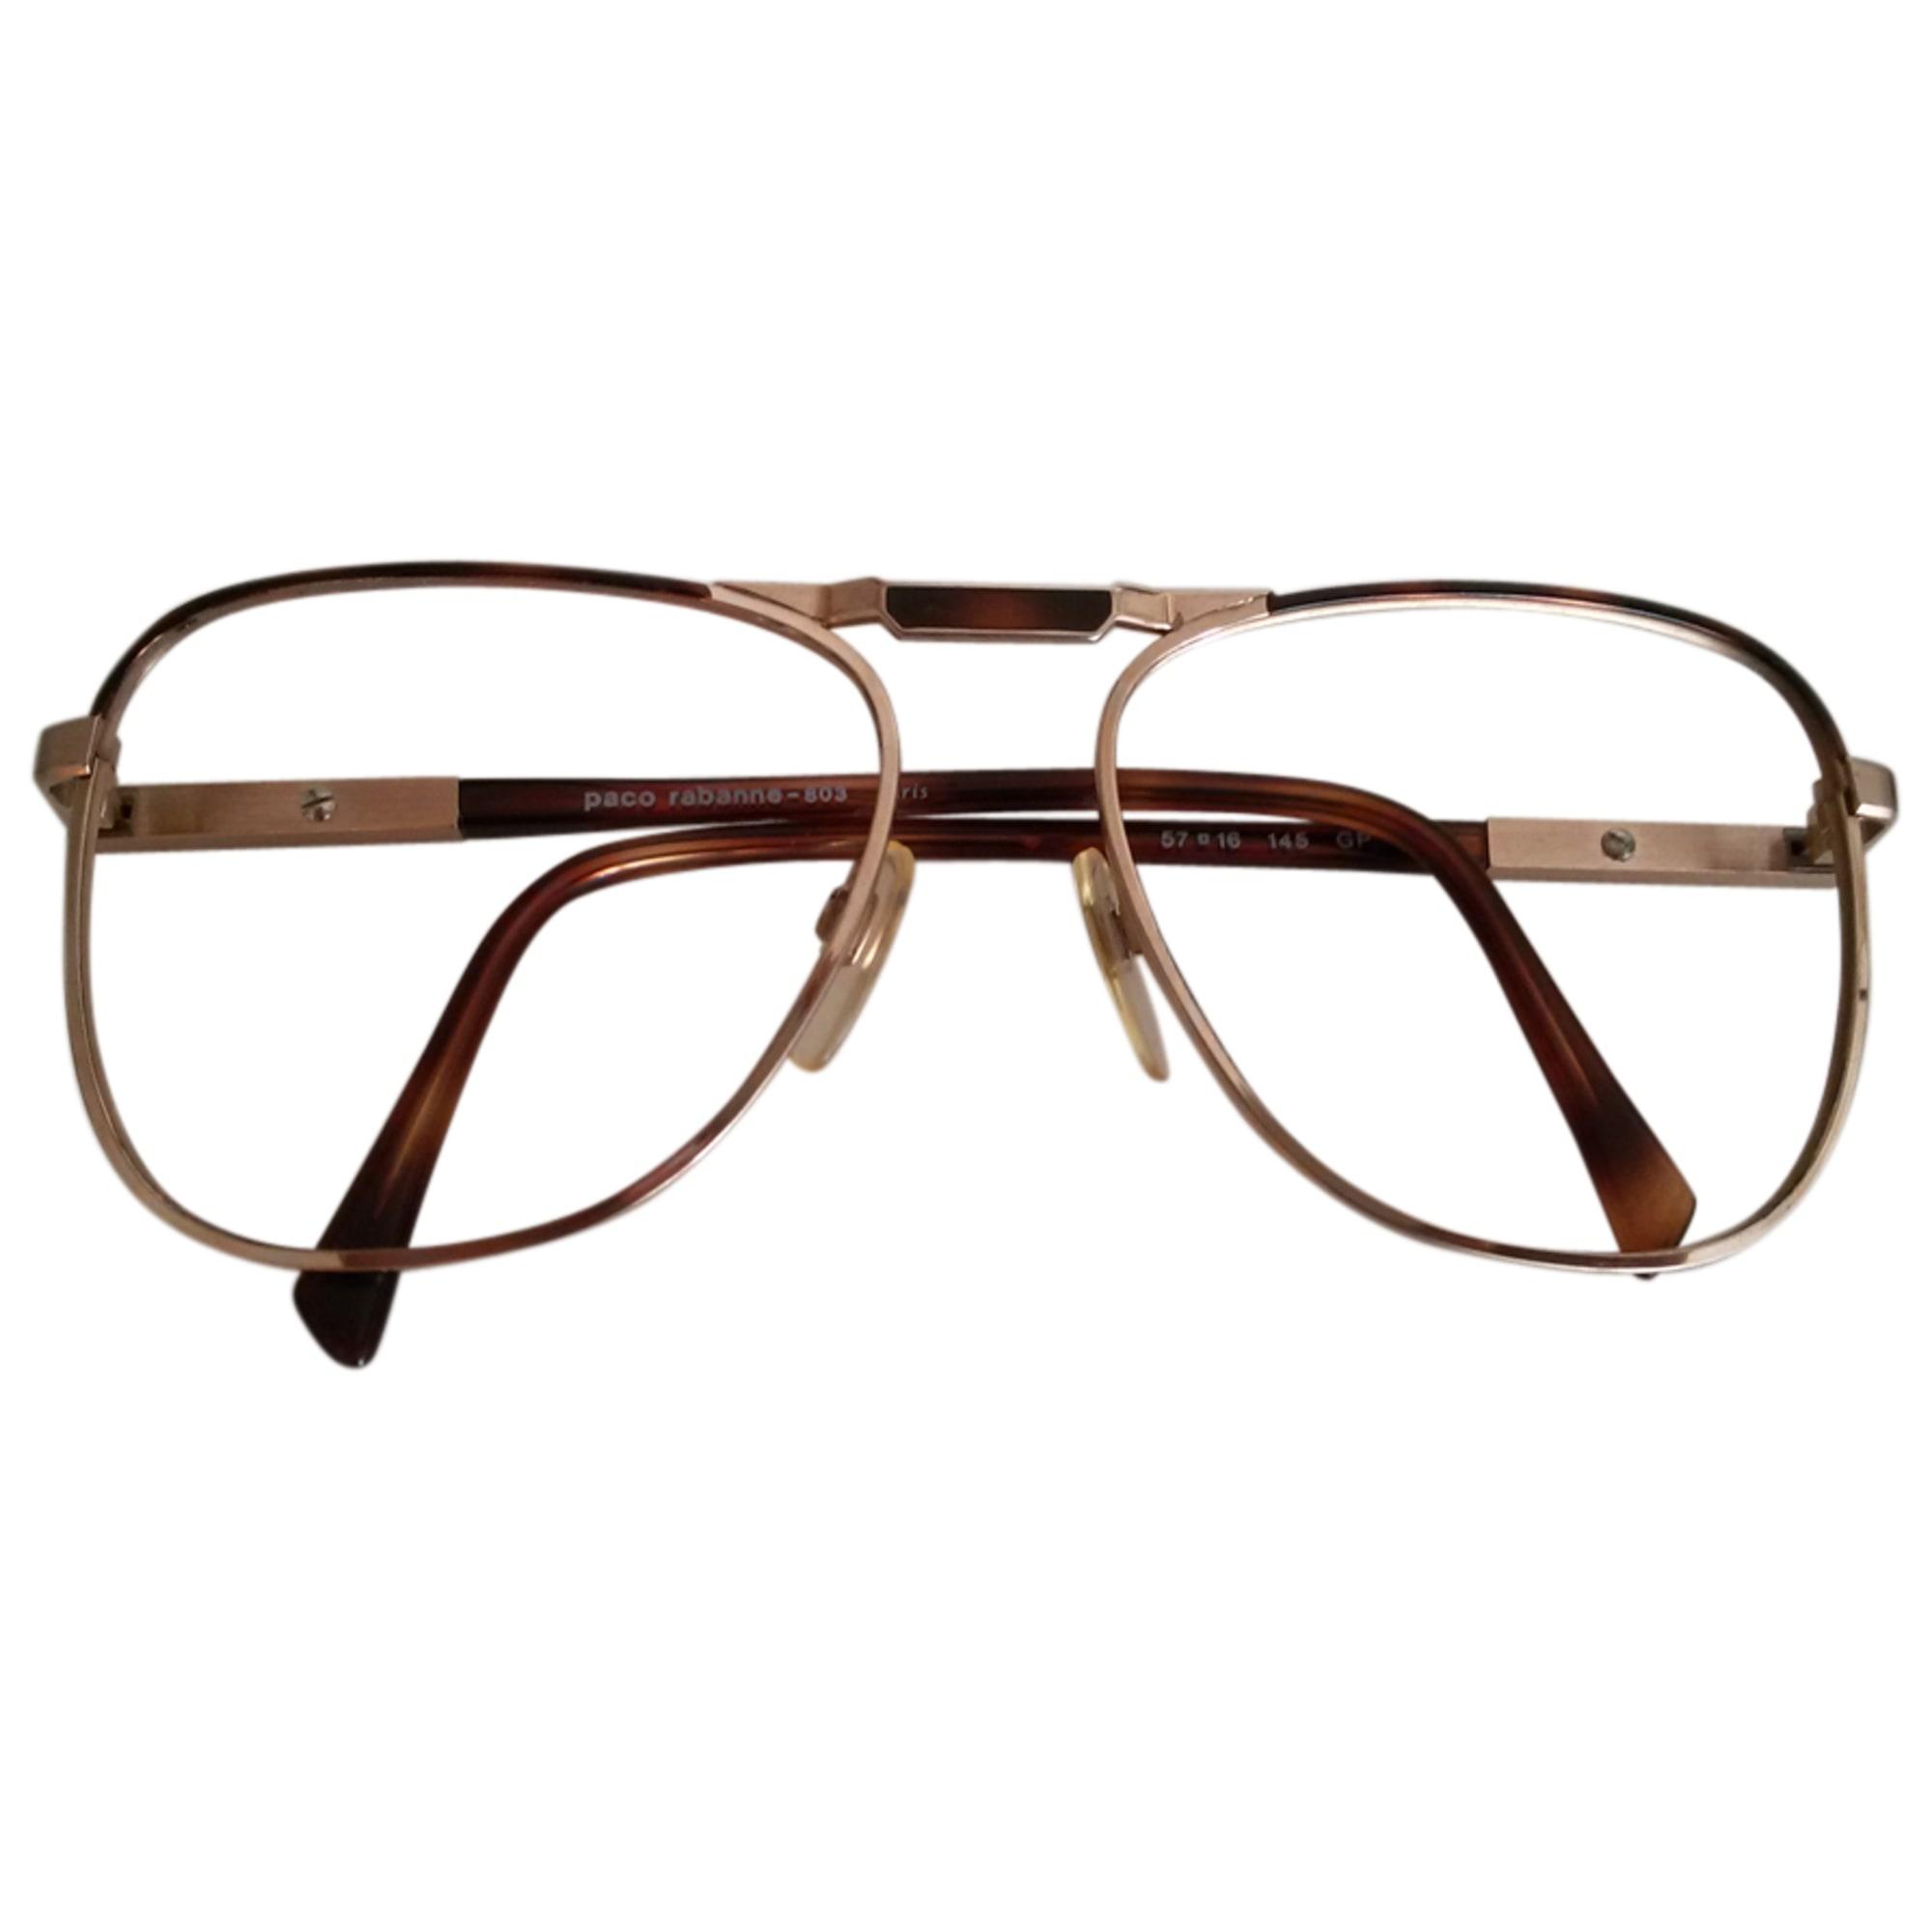 Eyeglass Frames PACO RABANNE golden vendu par Gio112 - 3526123